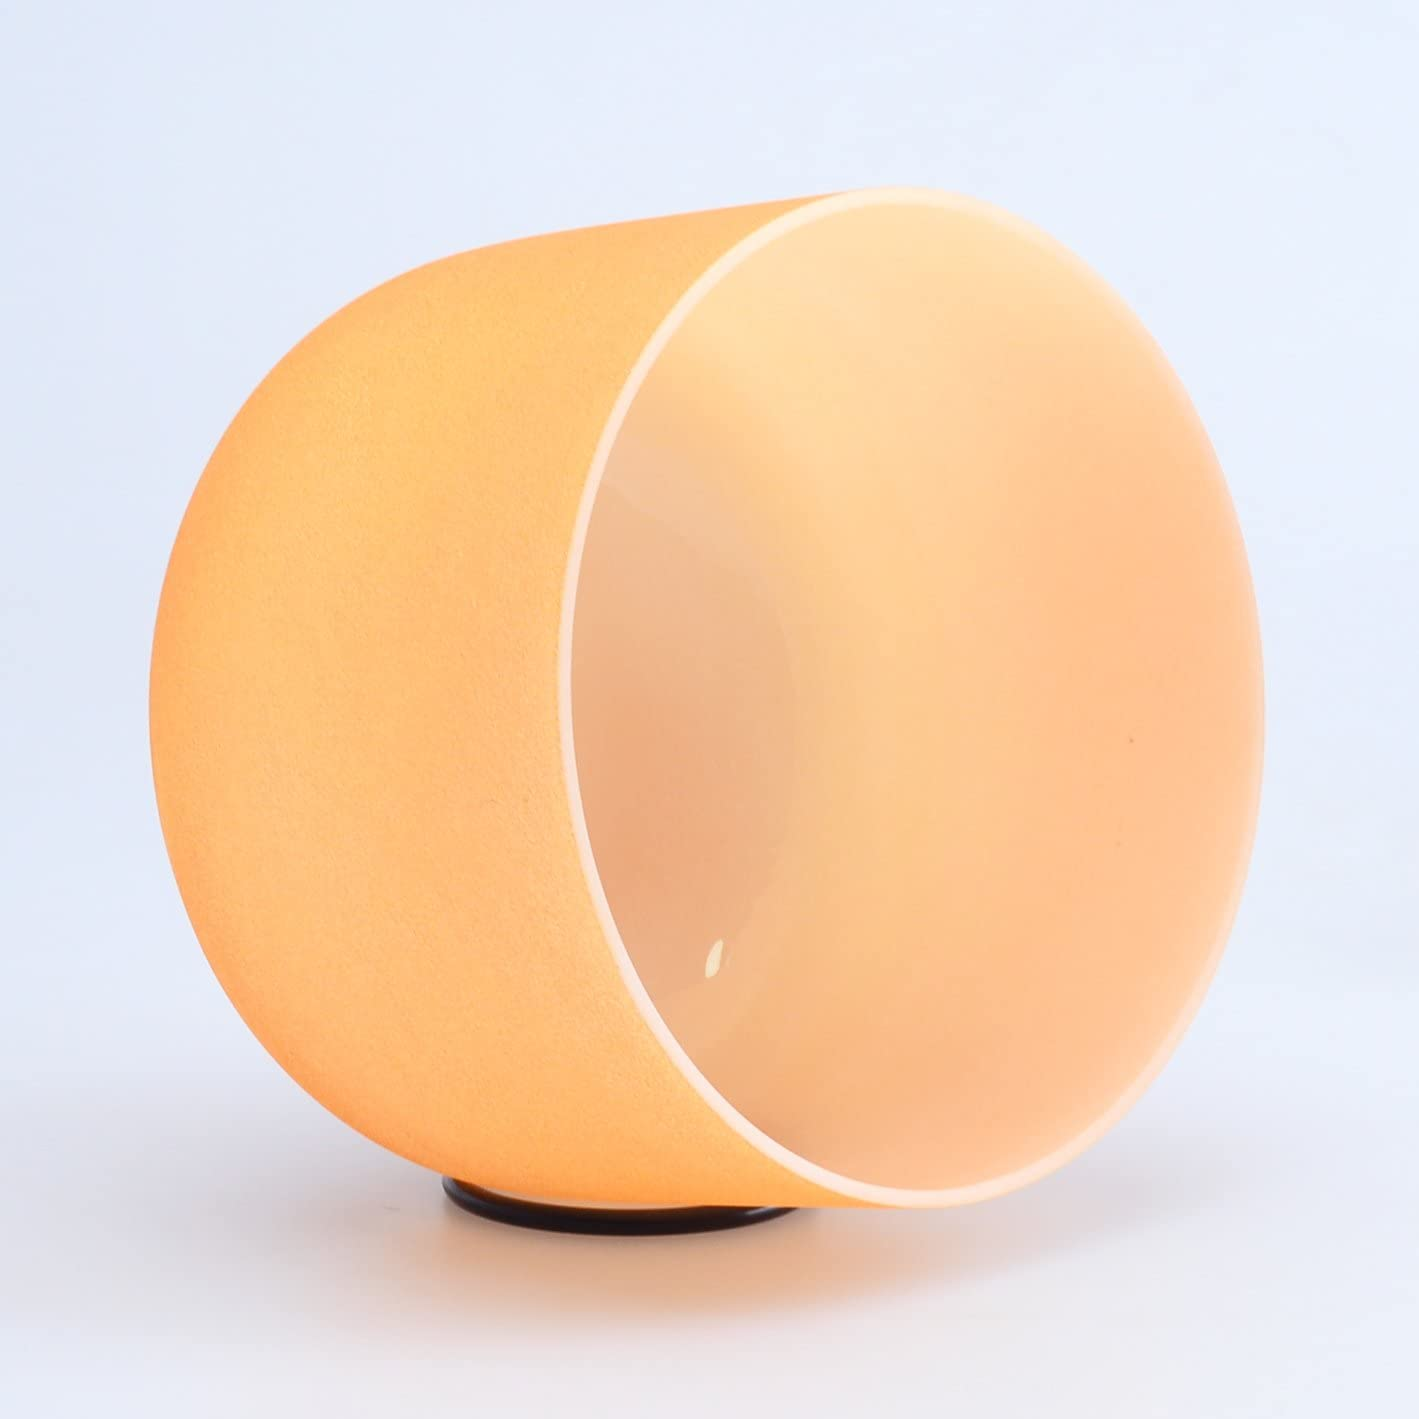 440HZ 10 D# Sexual Orange Chakra Quartz Crystal Singing Bowl